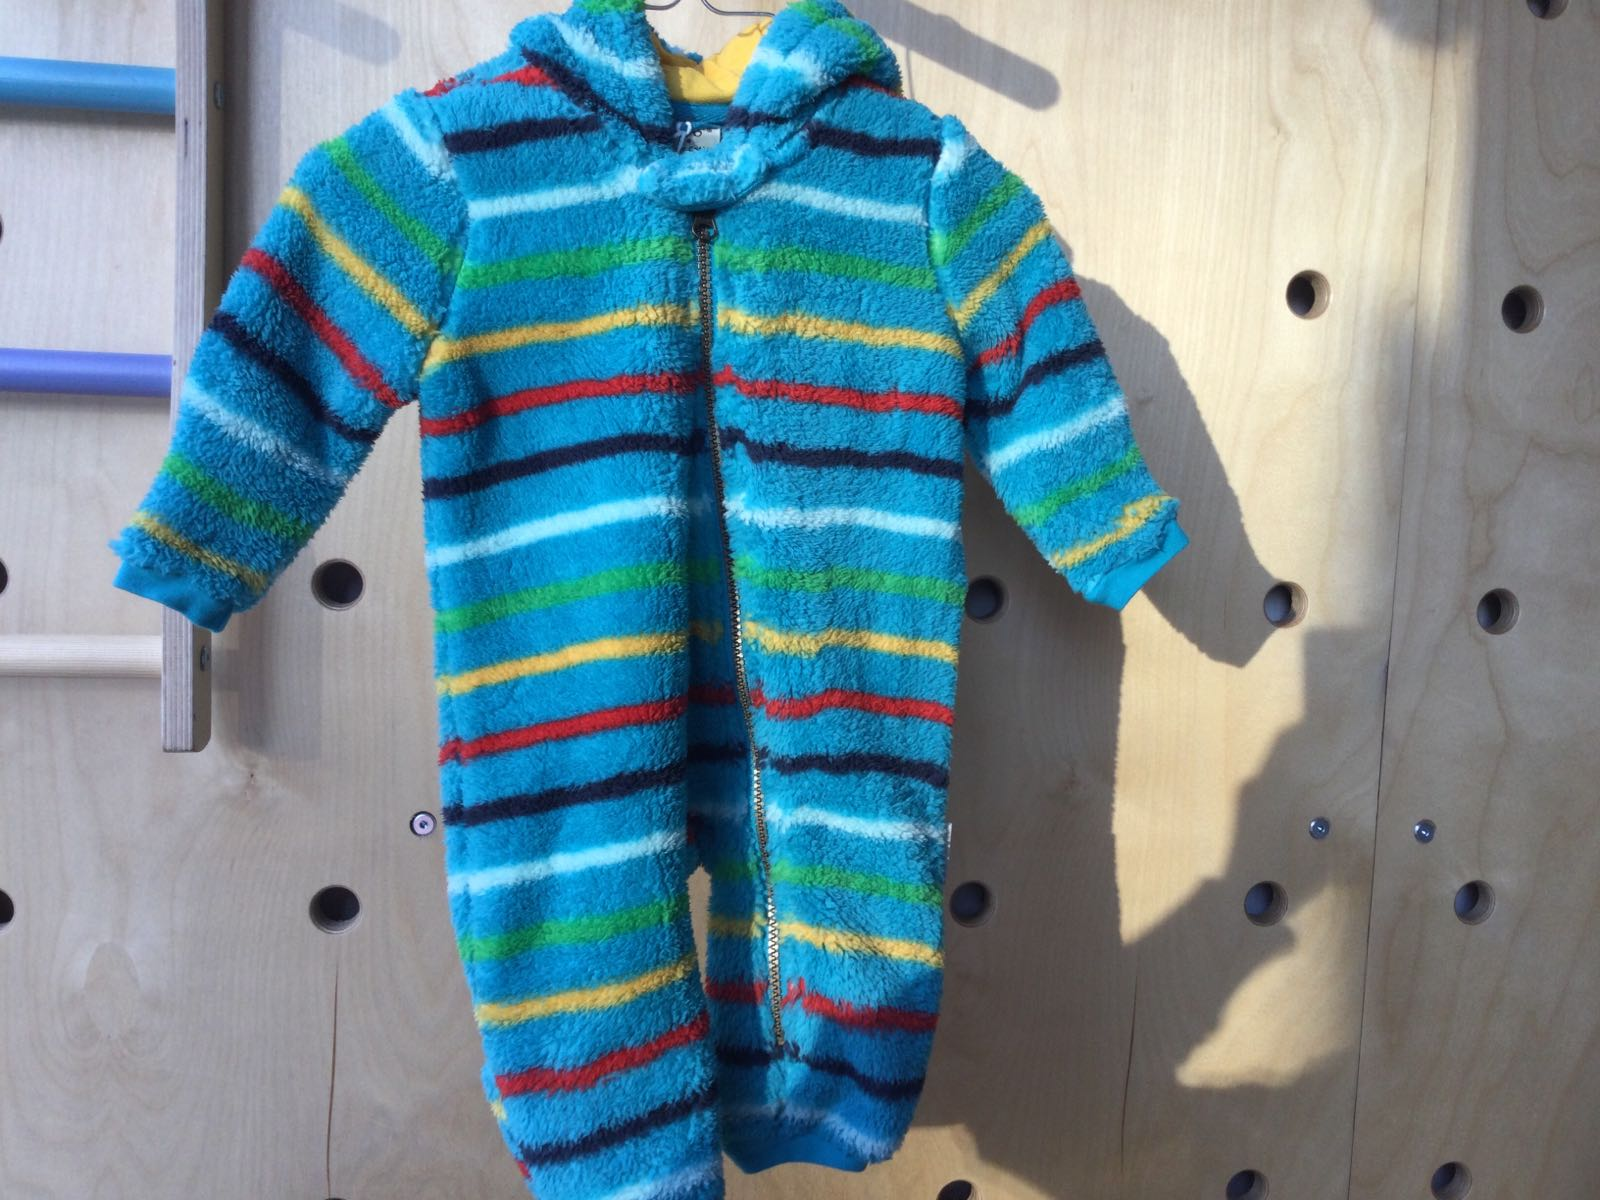 Frugi - Ted fleece snuggle Suit - Tobemart Rainbow Stripe